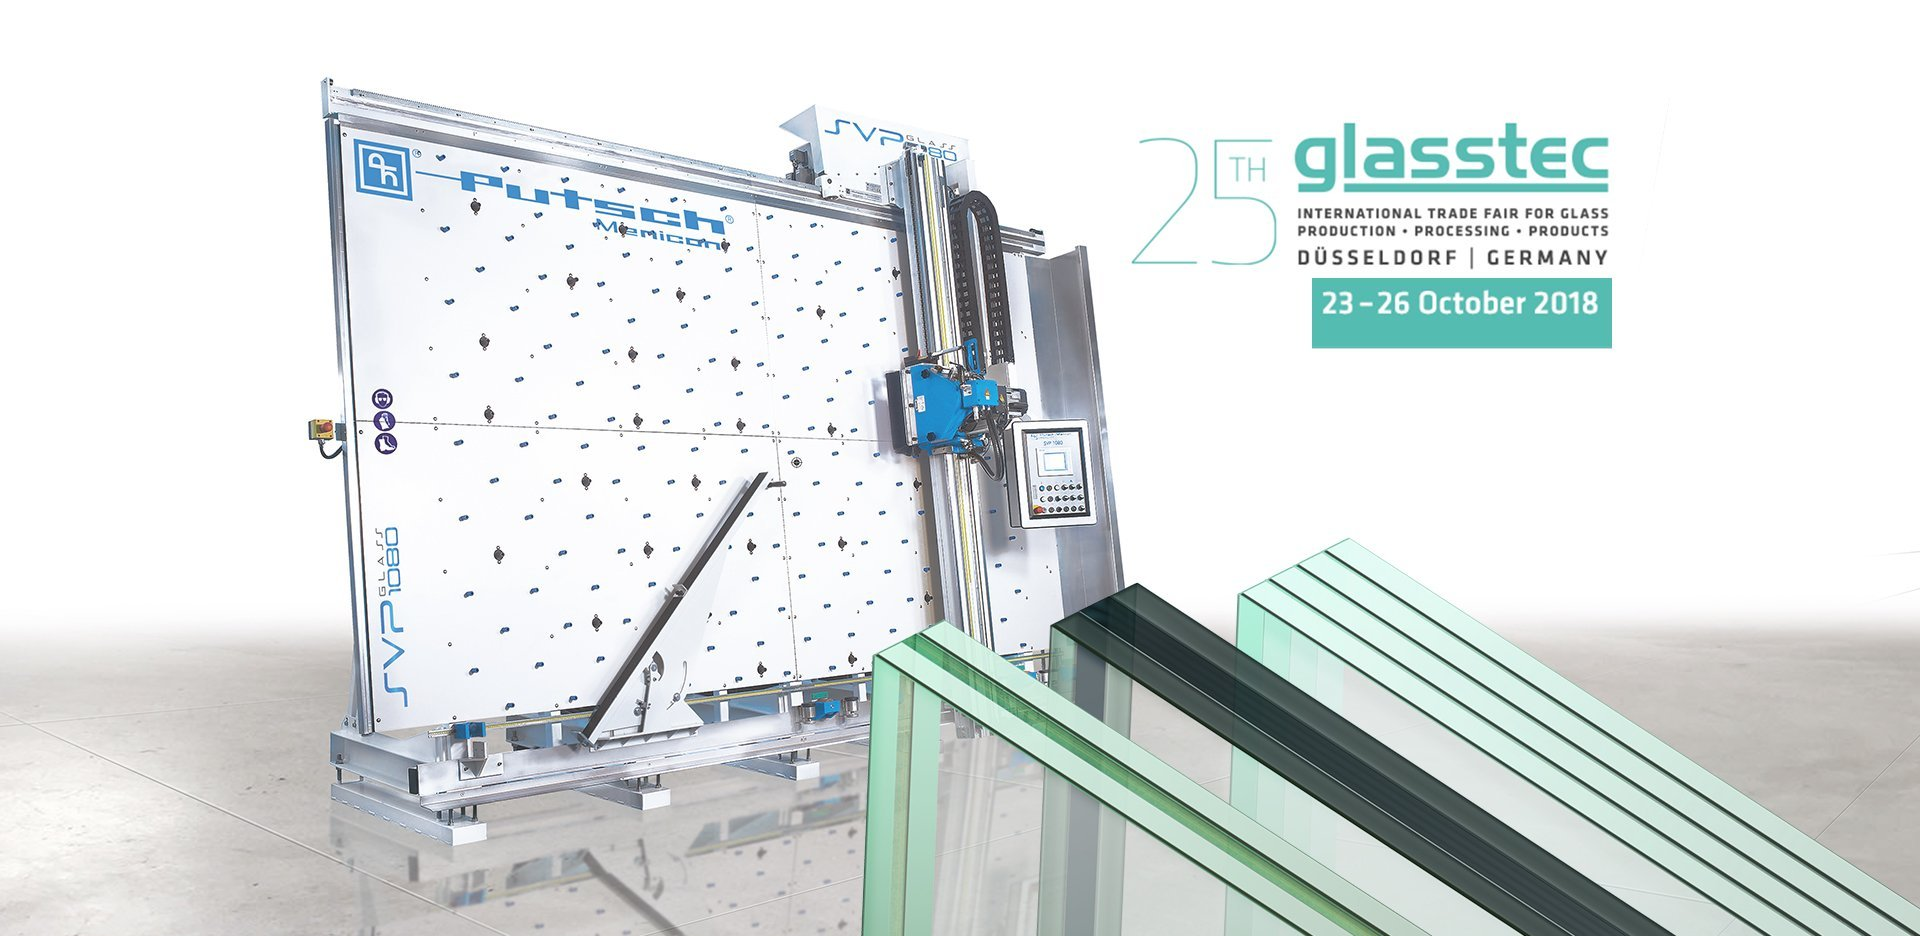 25° Glasstec Düsseldorf Germany